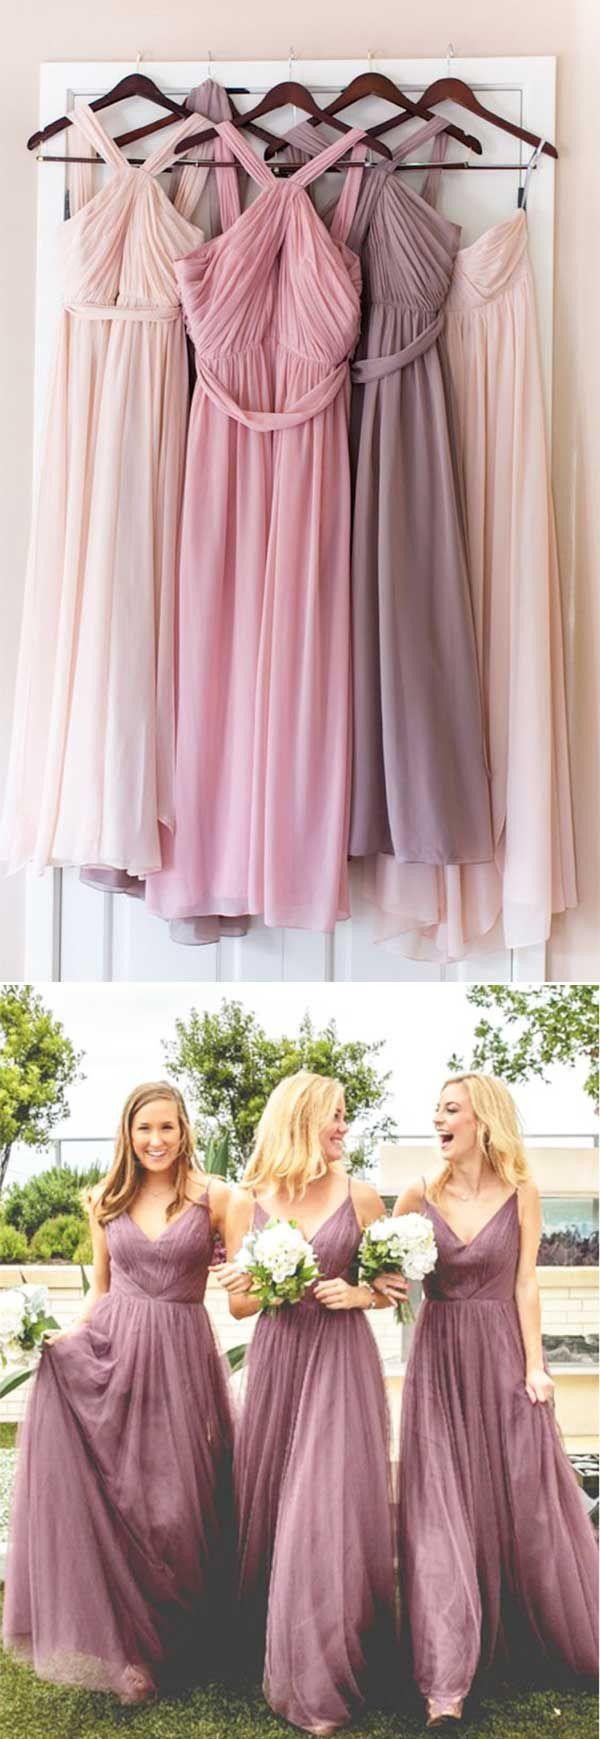 2018 STYLISH & PRETTIEST WEDDING COLOR TREND : SHADE OF MAUVE ...